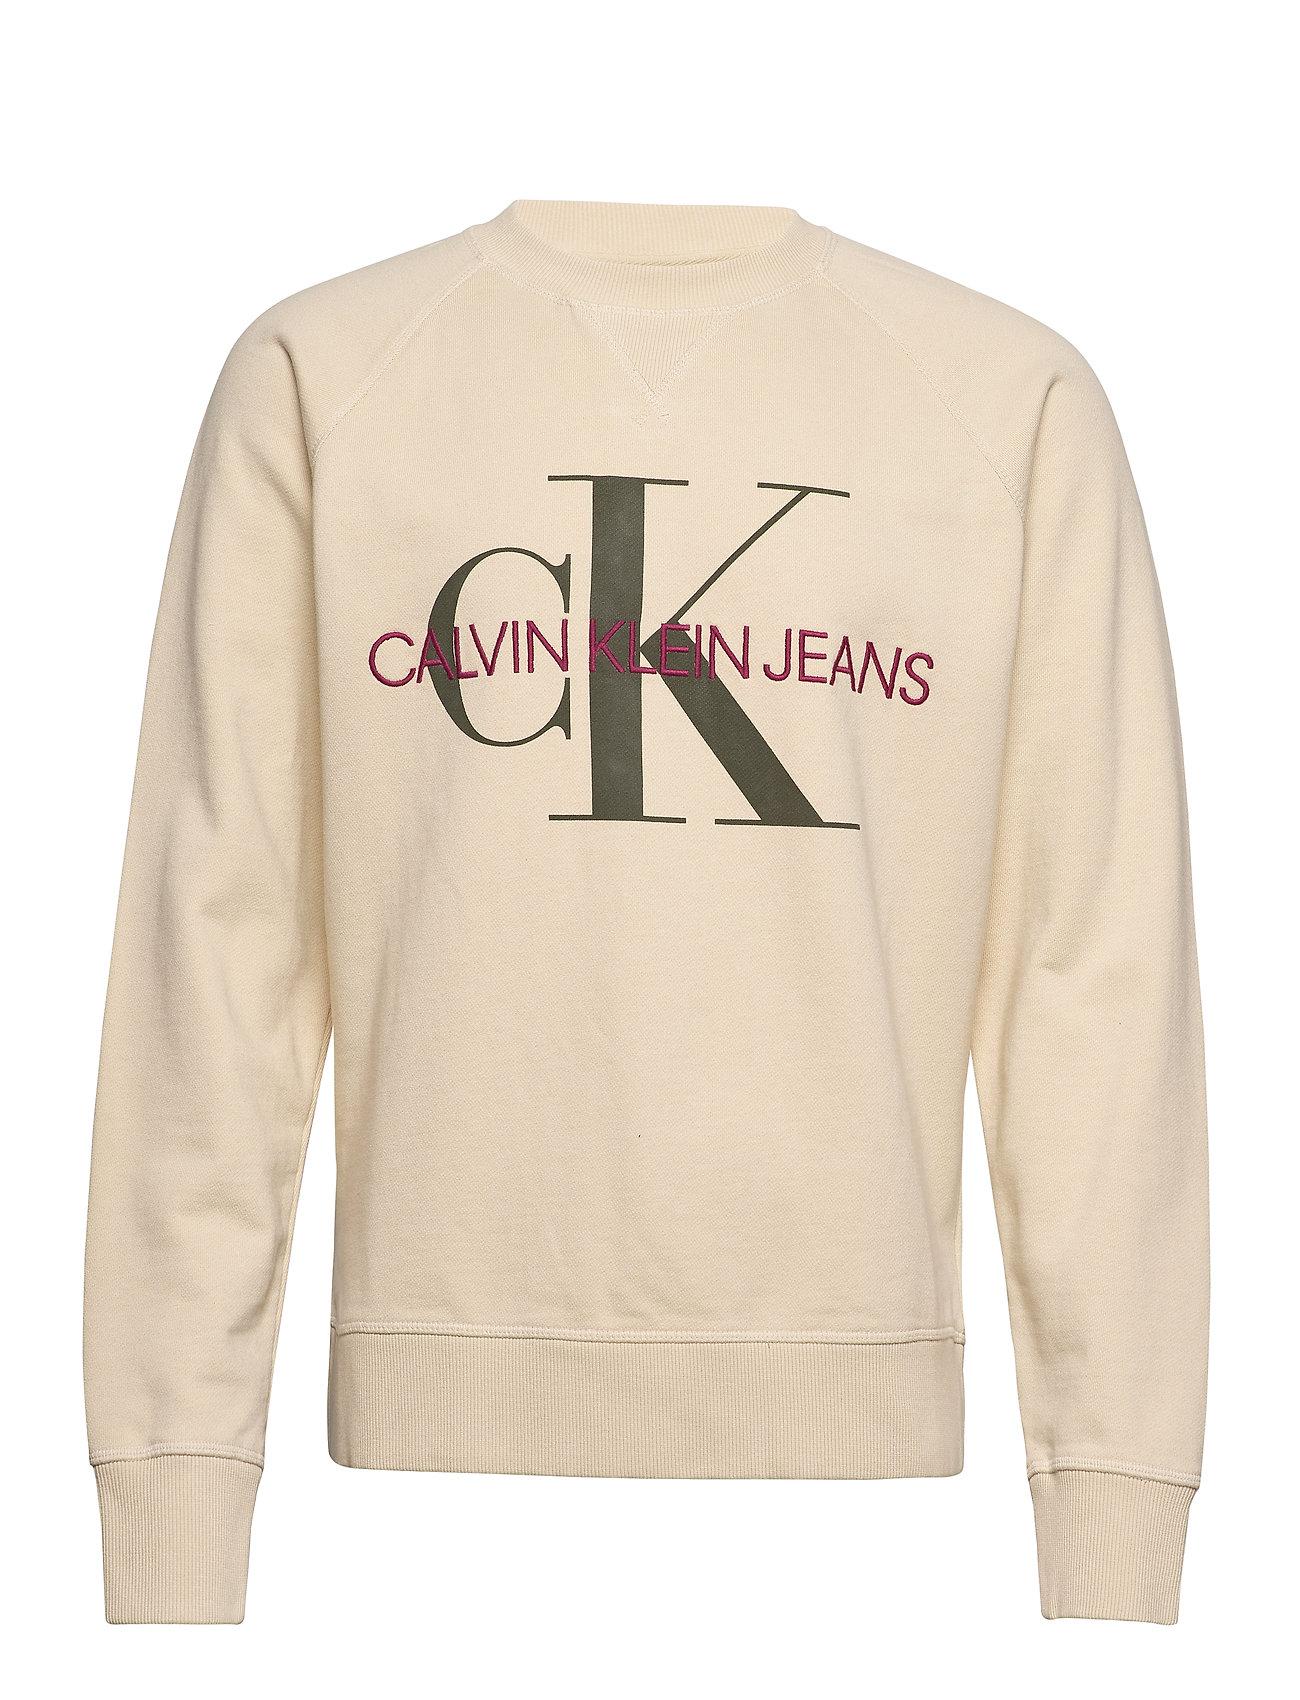 Calvin Klein Jeans WASHED REG MONOGRAM CN - BLEACHED SAND